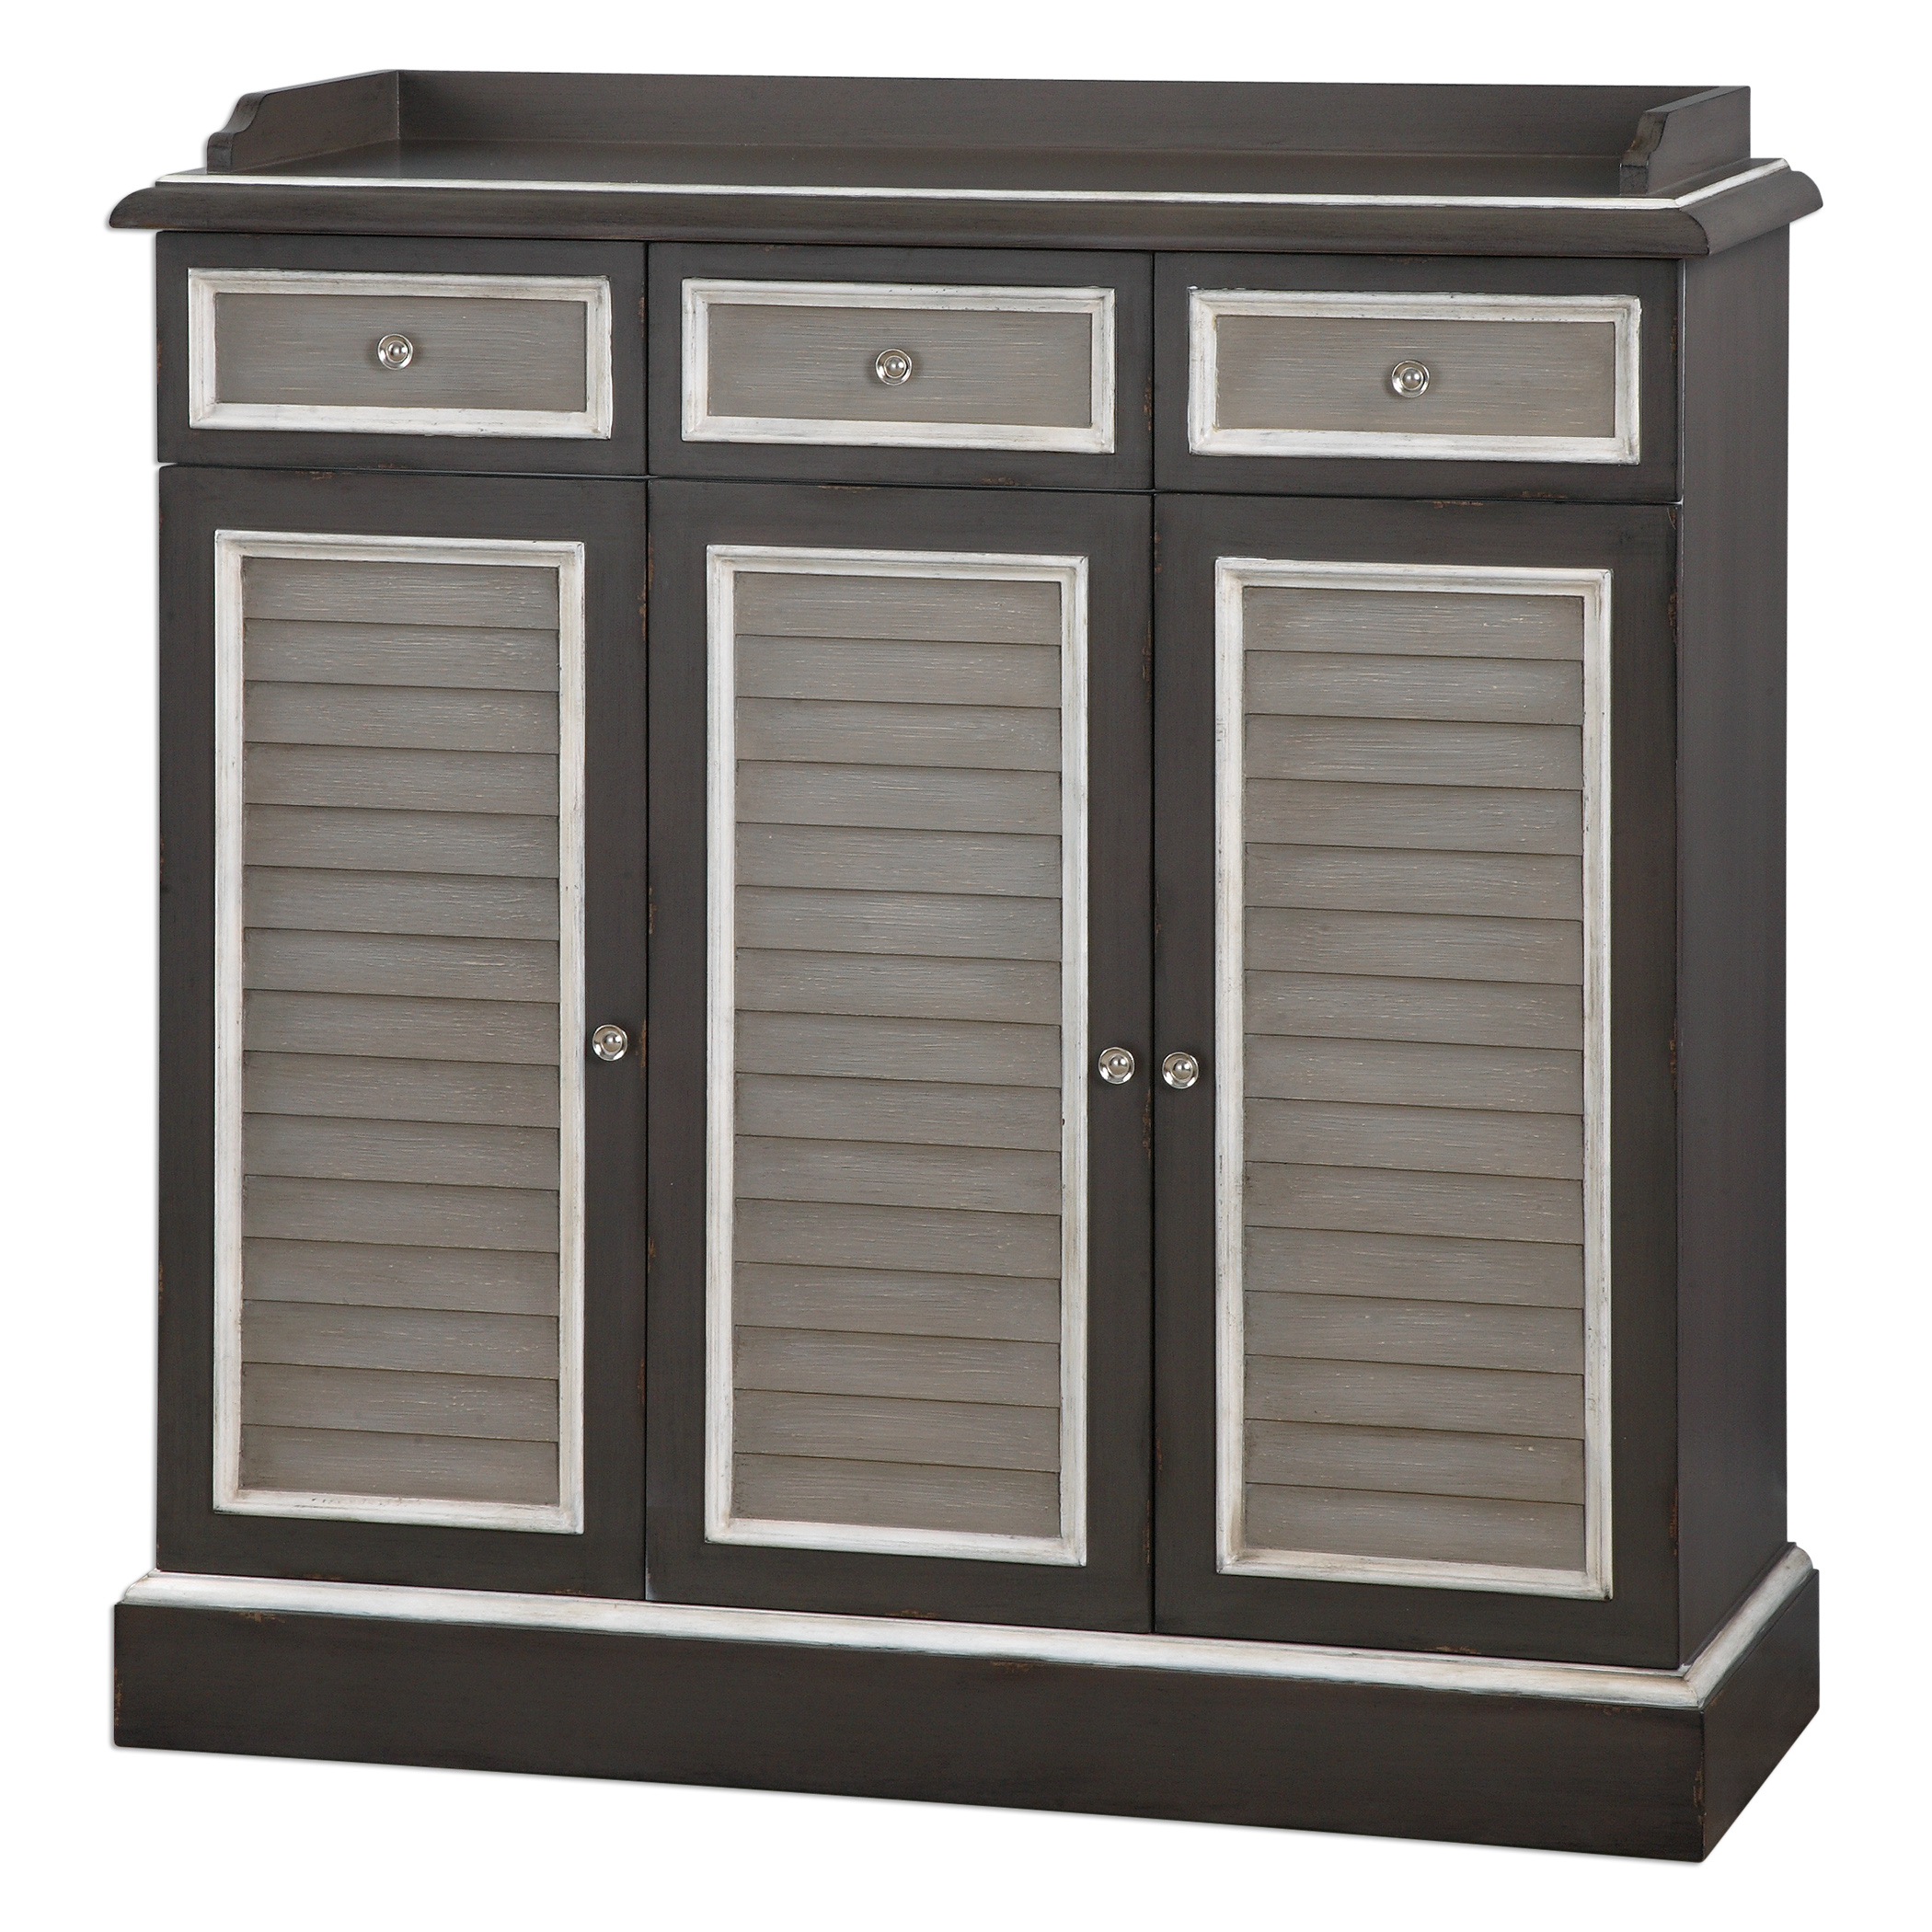 Uttermost Accent Furniture Prospera Warm Gray Buffet - Item Number: 24525